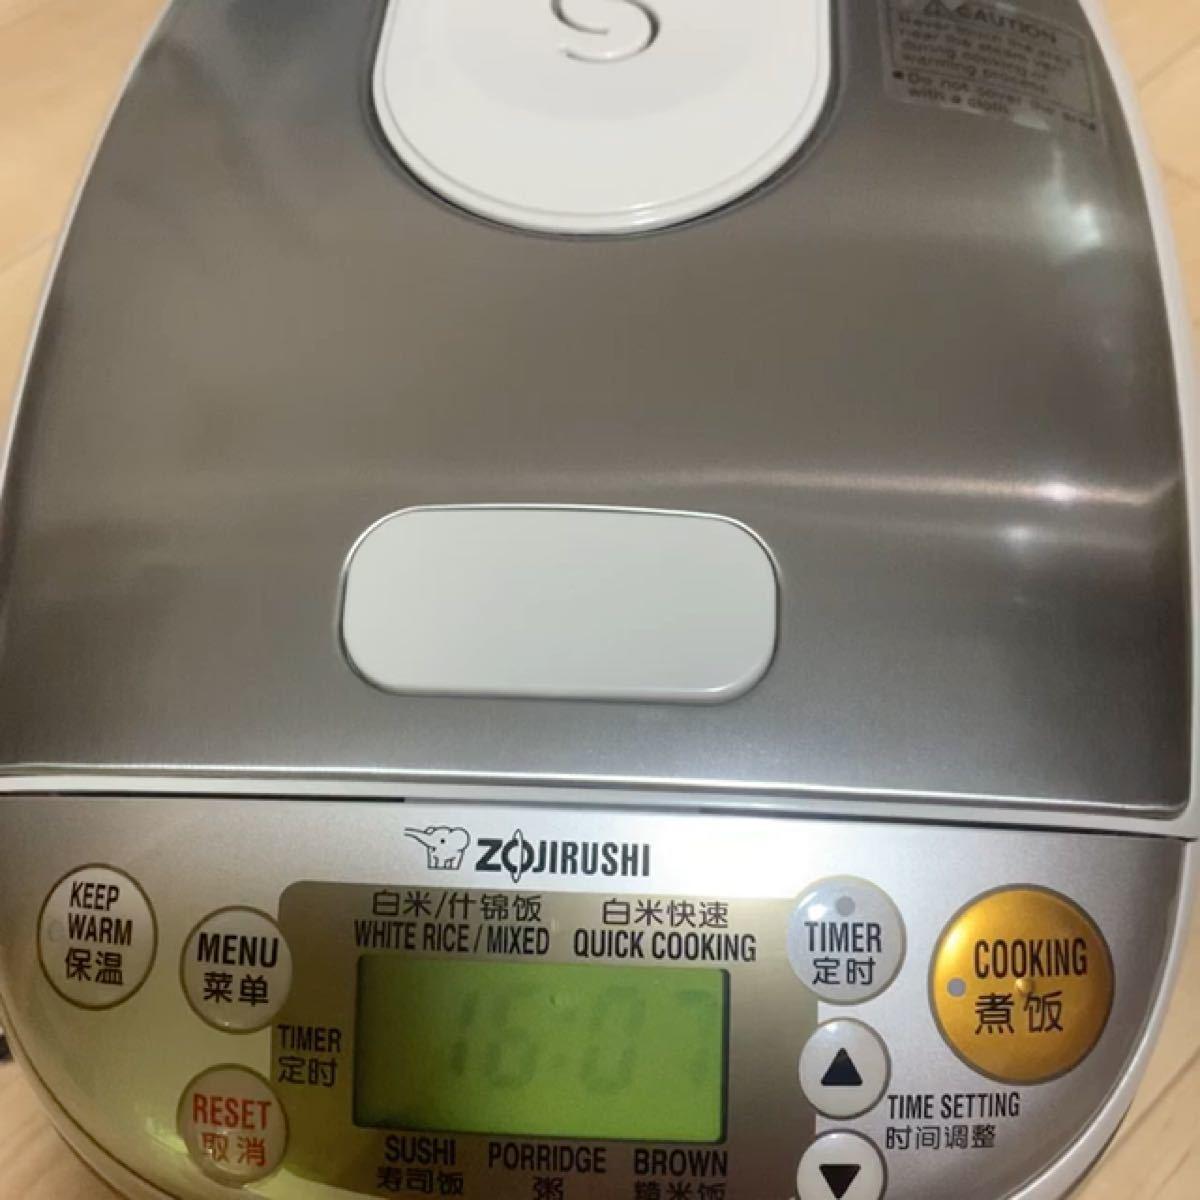 炊飯器 象印 ZOJIRUSHI NS-LLH05 海外対応